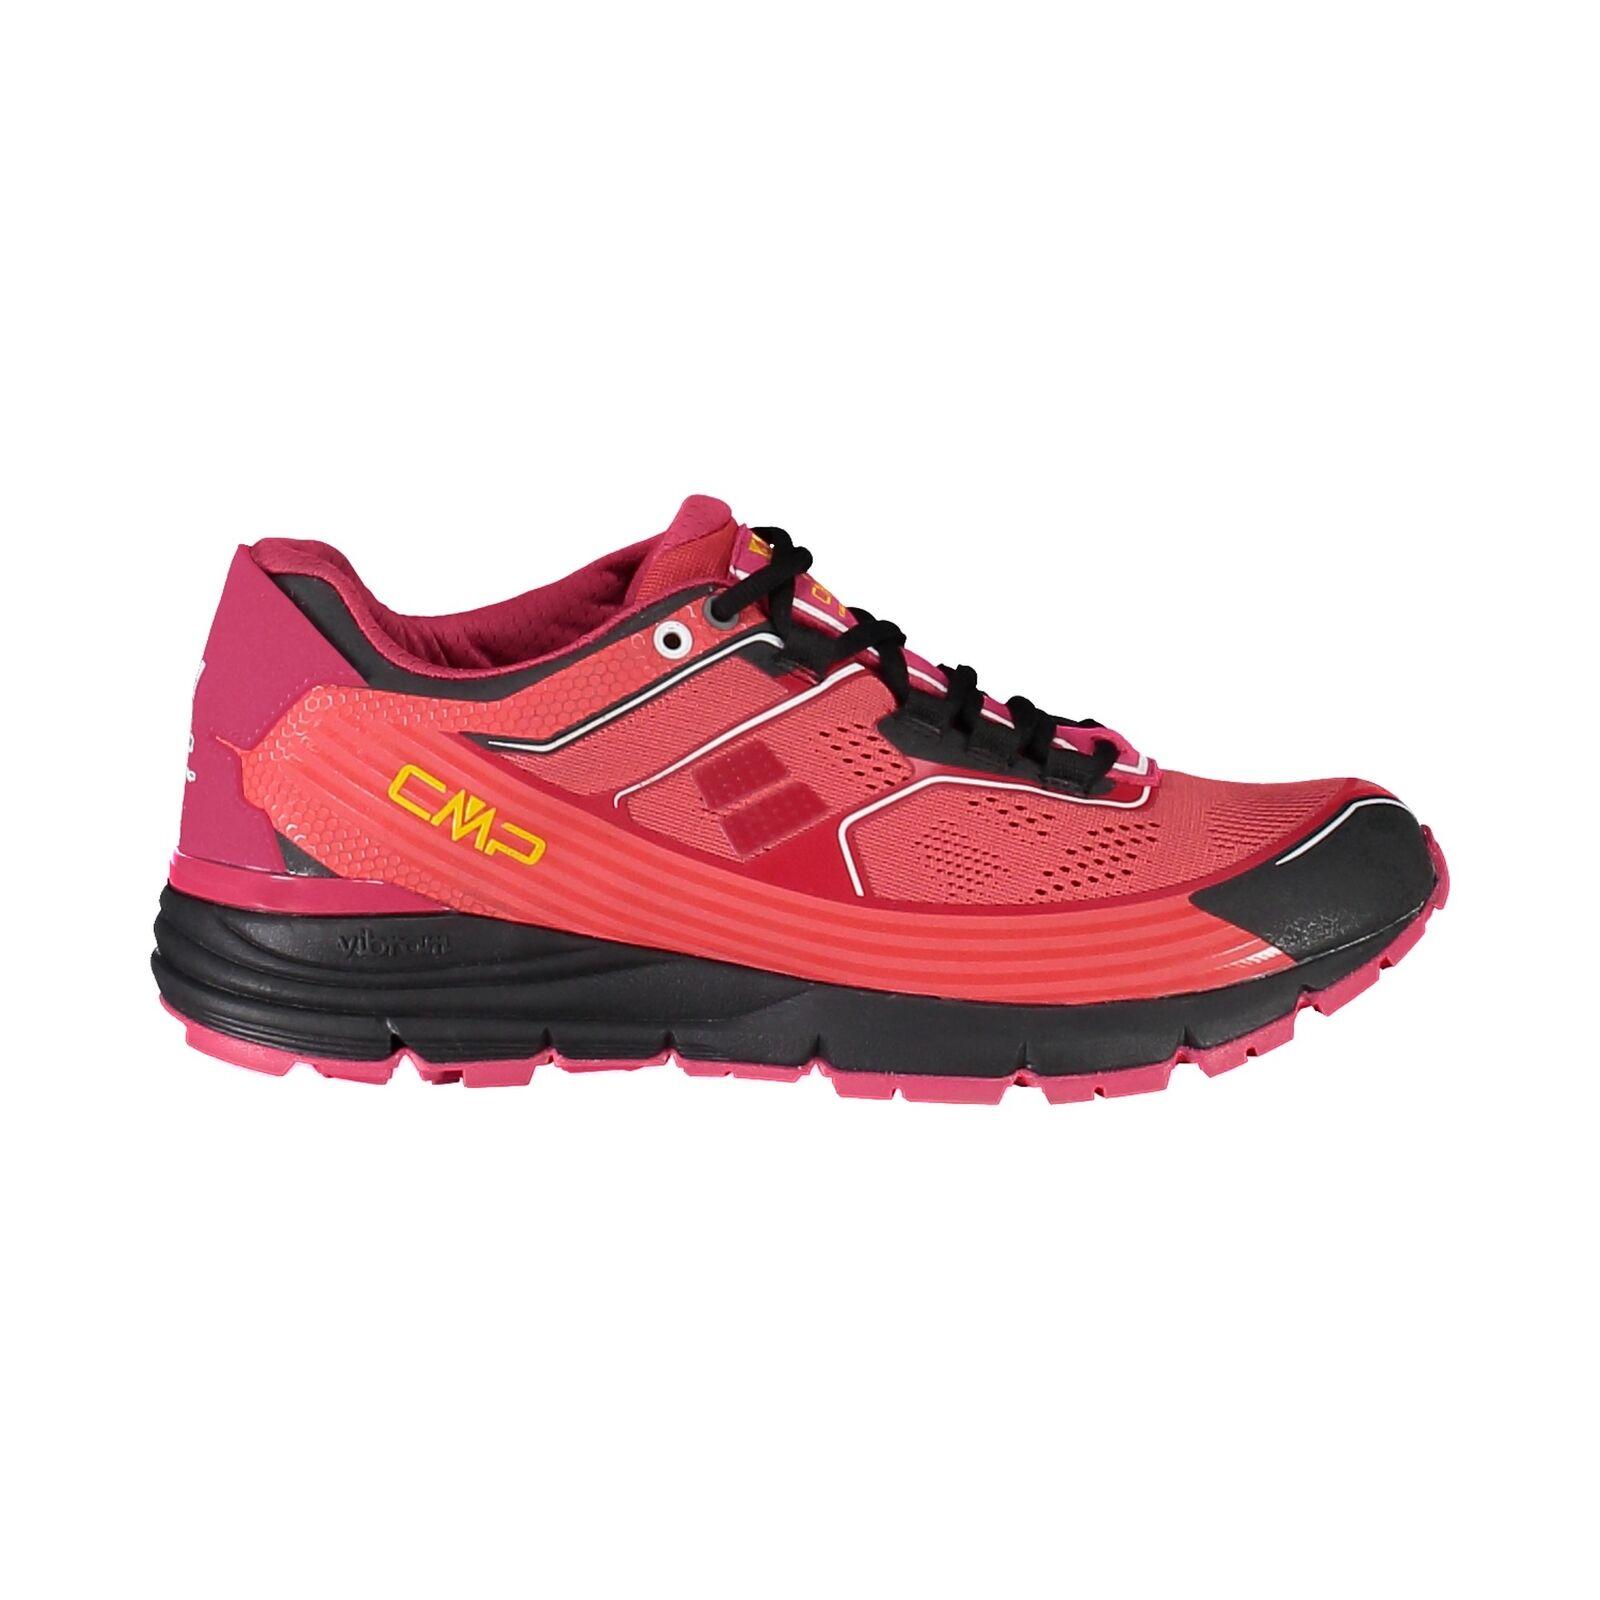 CMP Running Sports shoes Kursa Women's Trail shoes Wp orange Waterproof